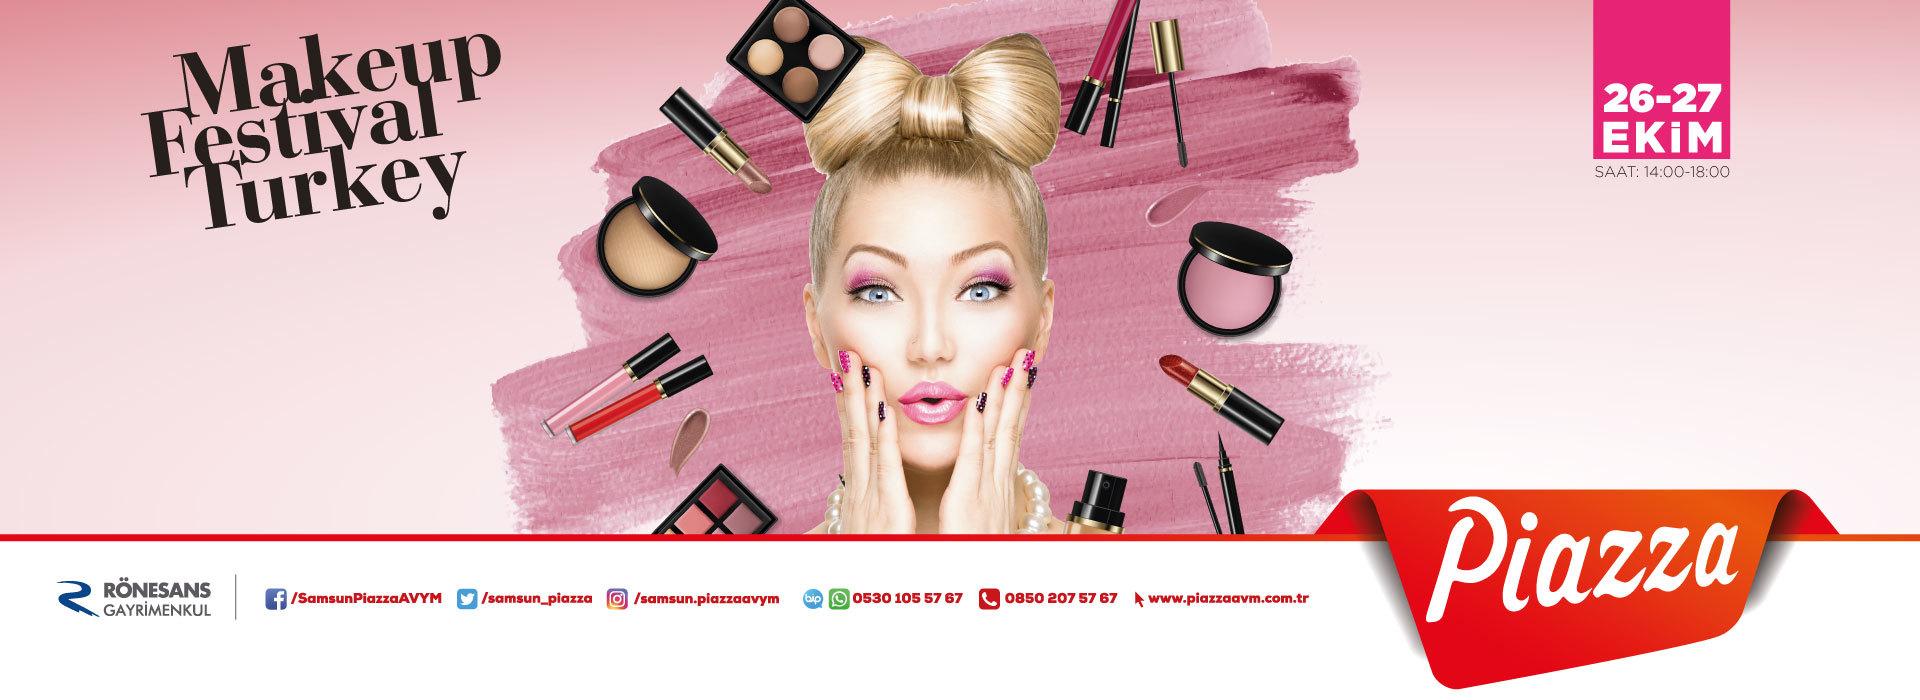 Makeup Festival Turkey